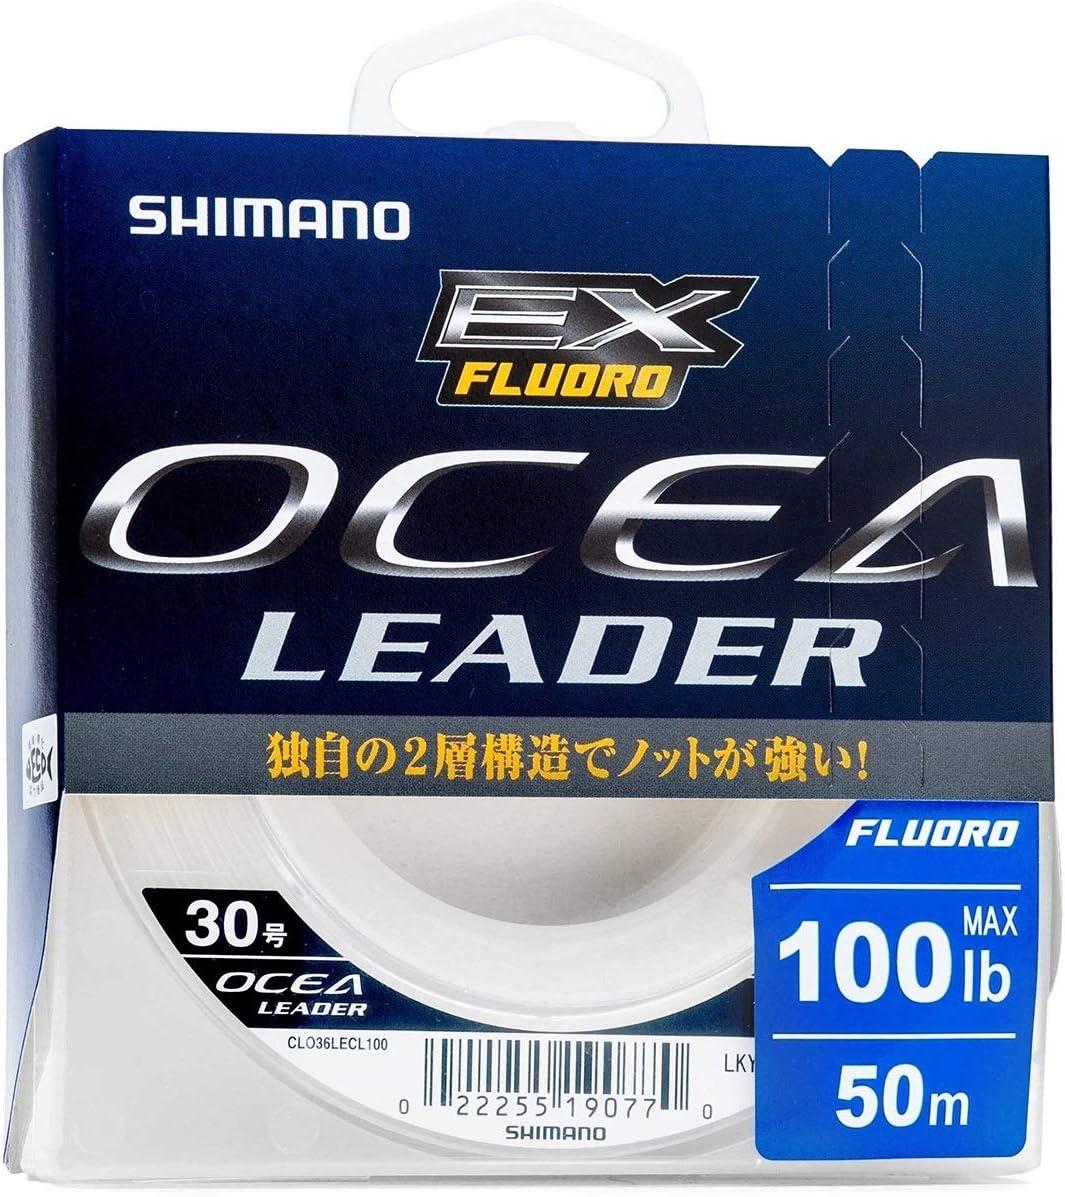 0732 Shimano CL-036L Ocea EX Fluorocarbon Leader Line 50m Size 12 40lb